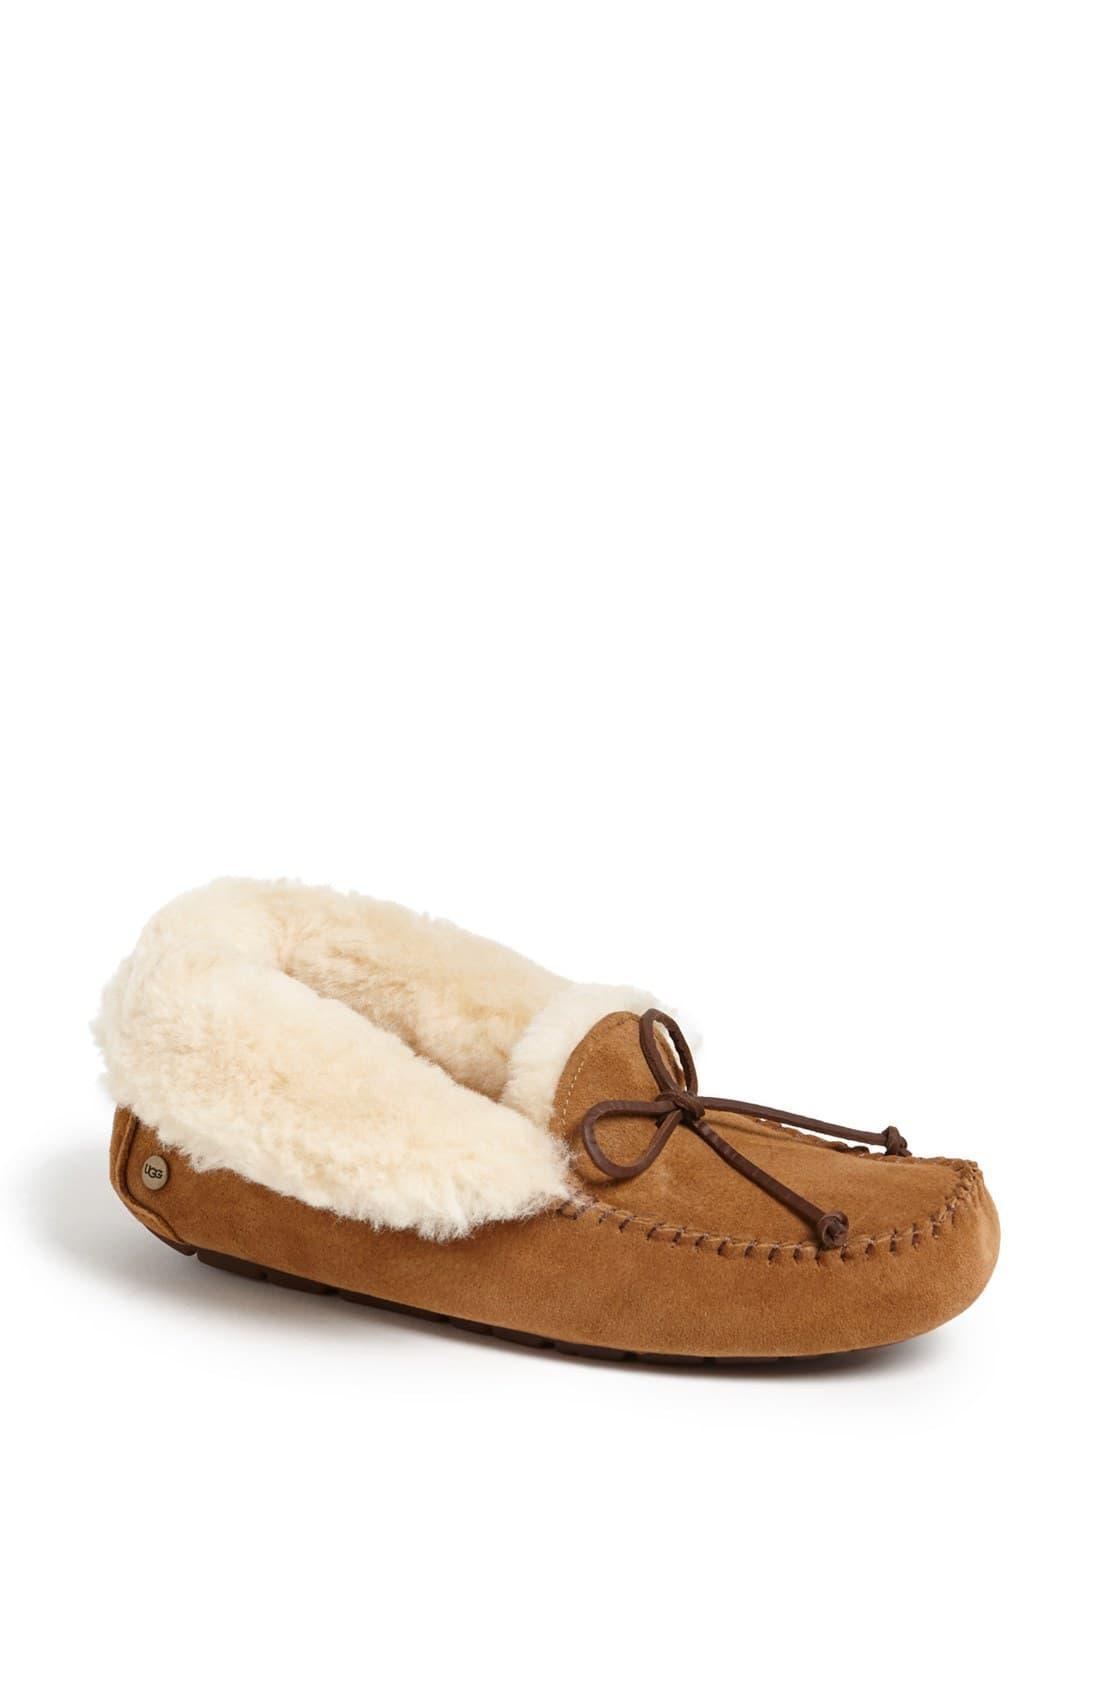 2059f6b64ad Women's Brown Uggpure Alena Suede Slipper Boots